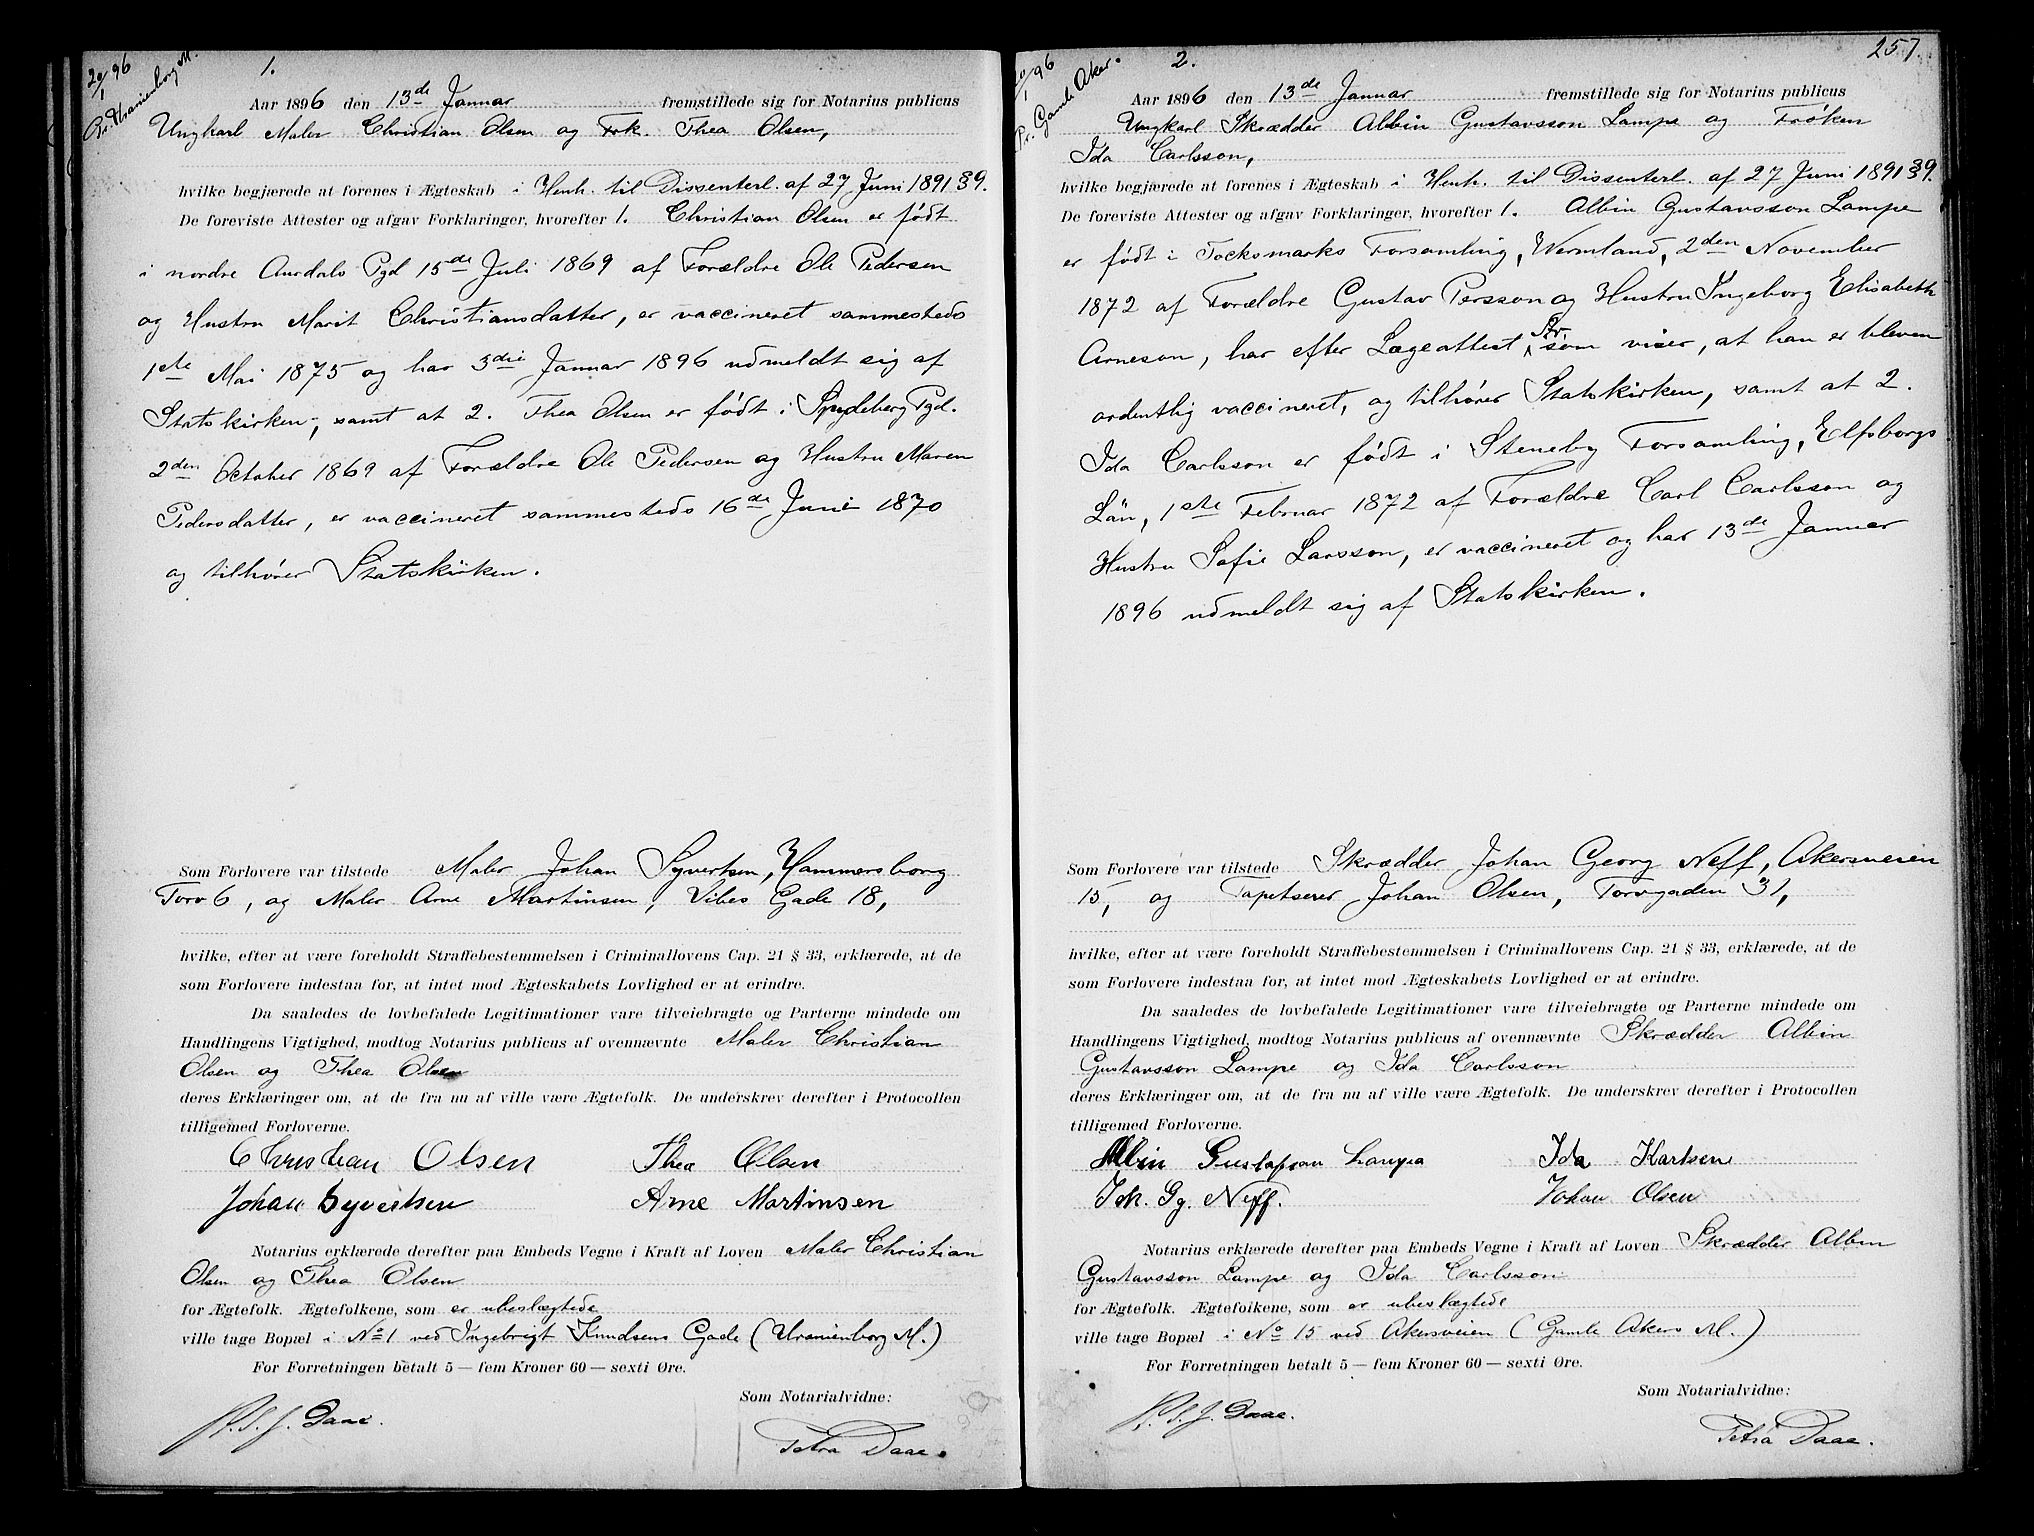 SAO, Oslo byfogd avd. I, L/Lb/Lbb/L0003: Notarialprotokoll, rekke II: Vigsler, 1893-1897, s. 256b-257a